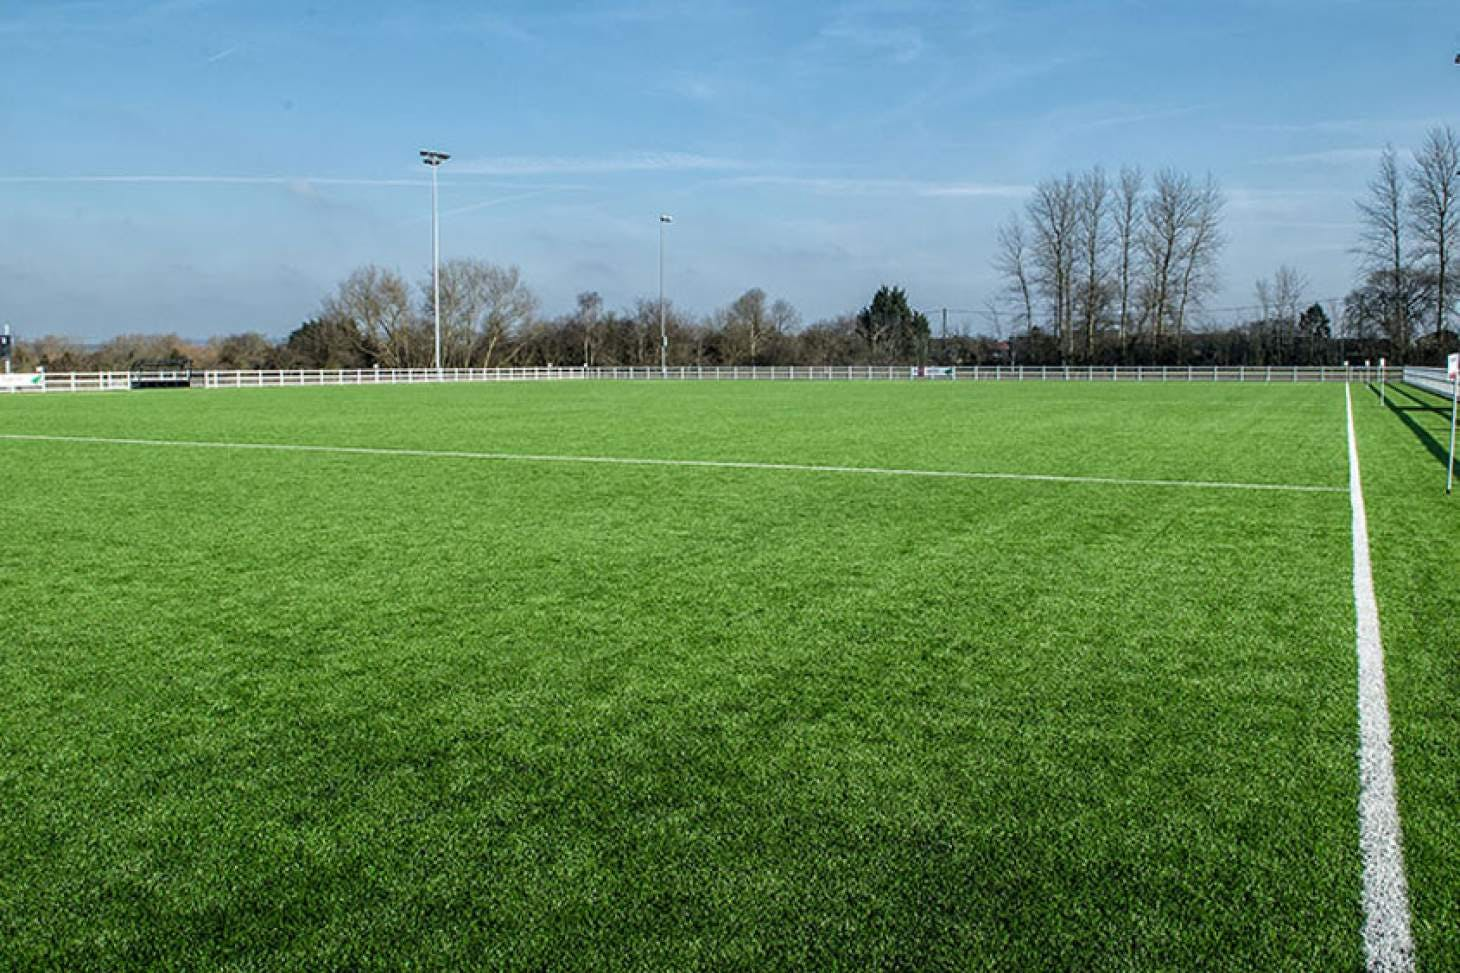 PlayFootball Stourbridge 5 a side | 3G Astroturf football pitch